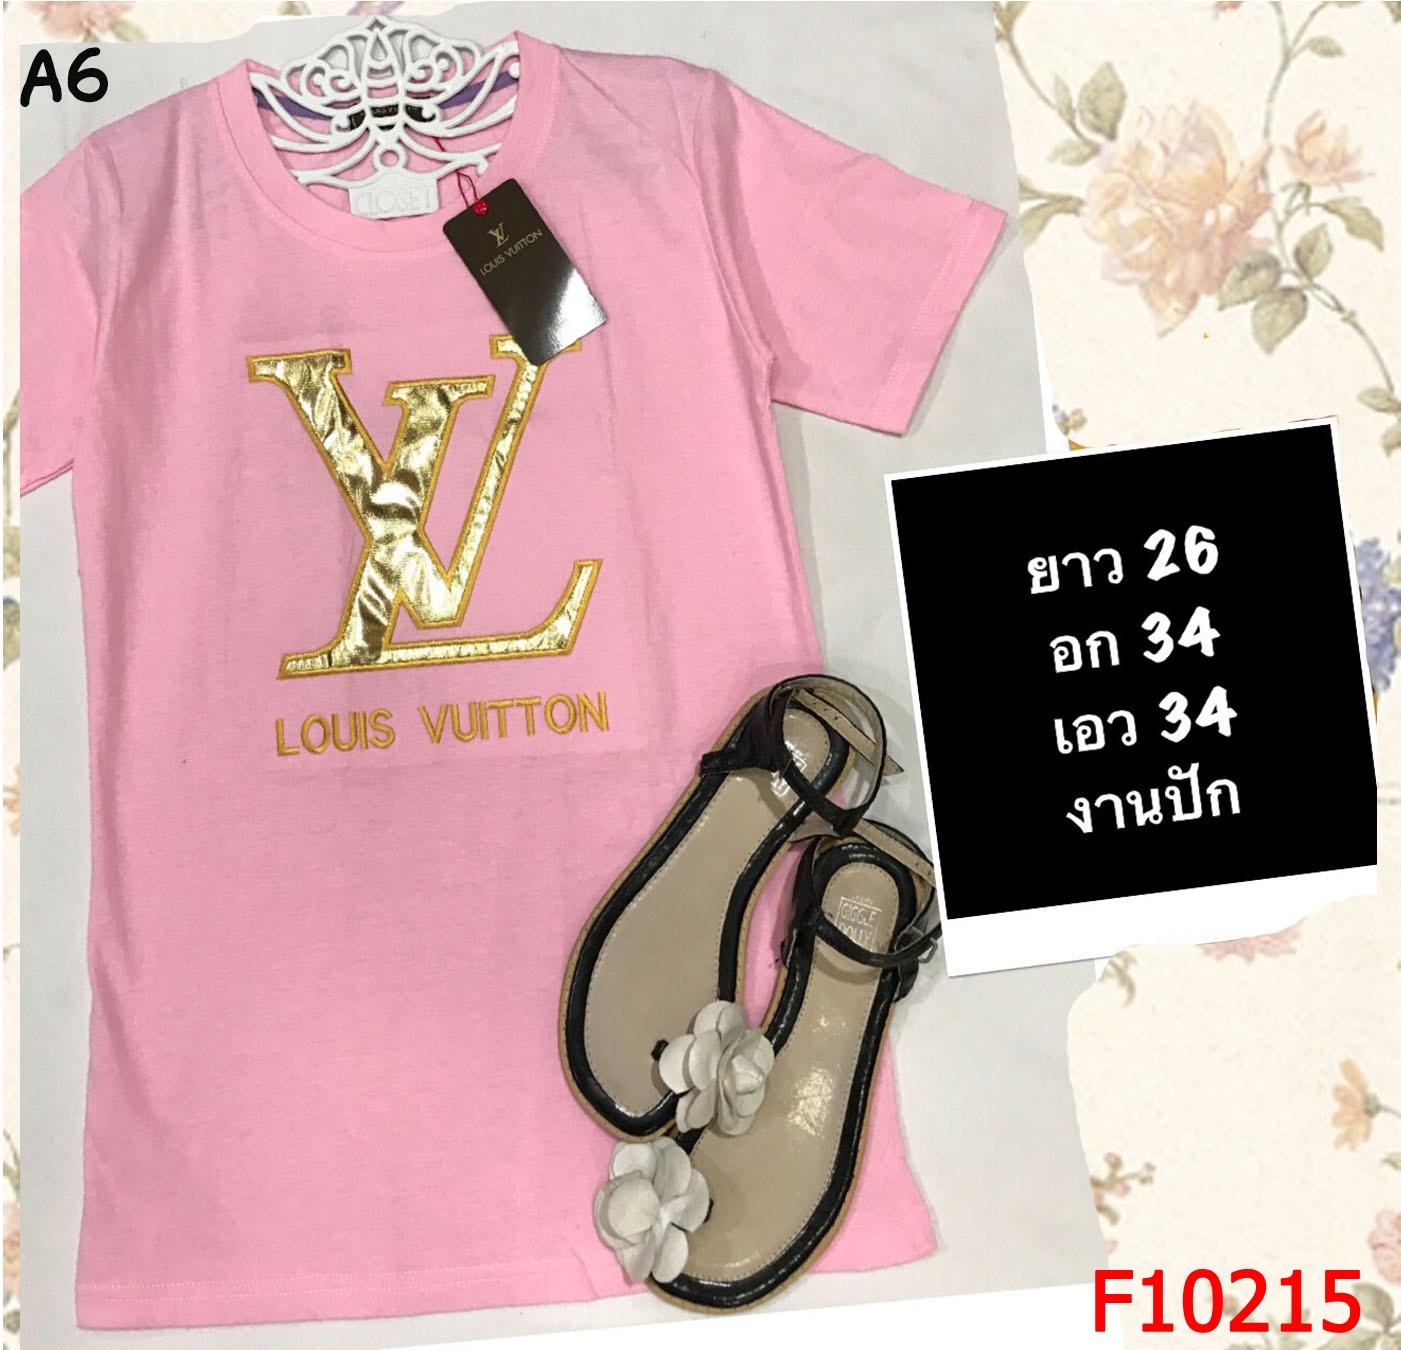 F10215 เสื้อยืด คอกลม สีชมพู งานปัก ลาย LV (หลุยส์)